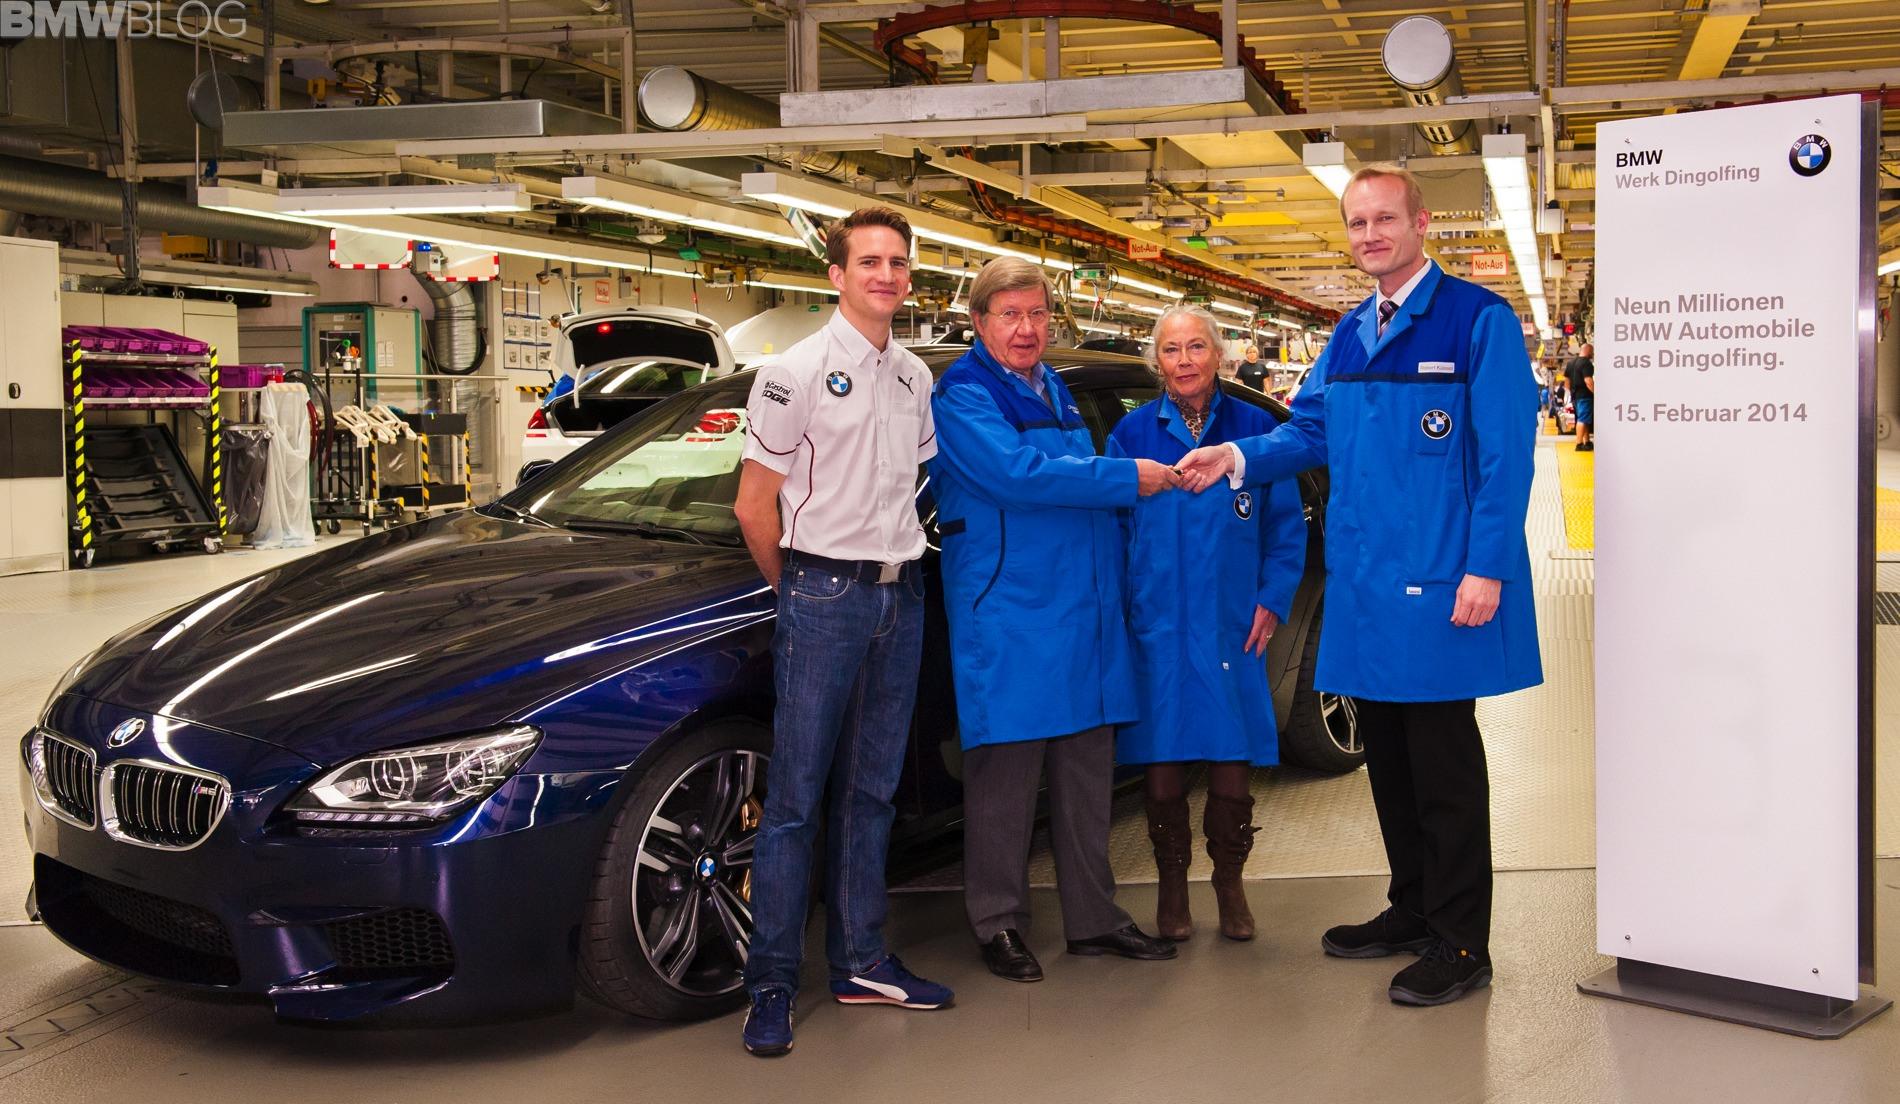 [Actualité] Groupe BMW - Page 16 Bmw-m6-gran-coupe-dingolfing-03